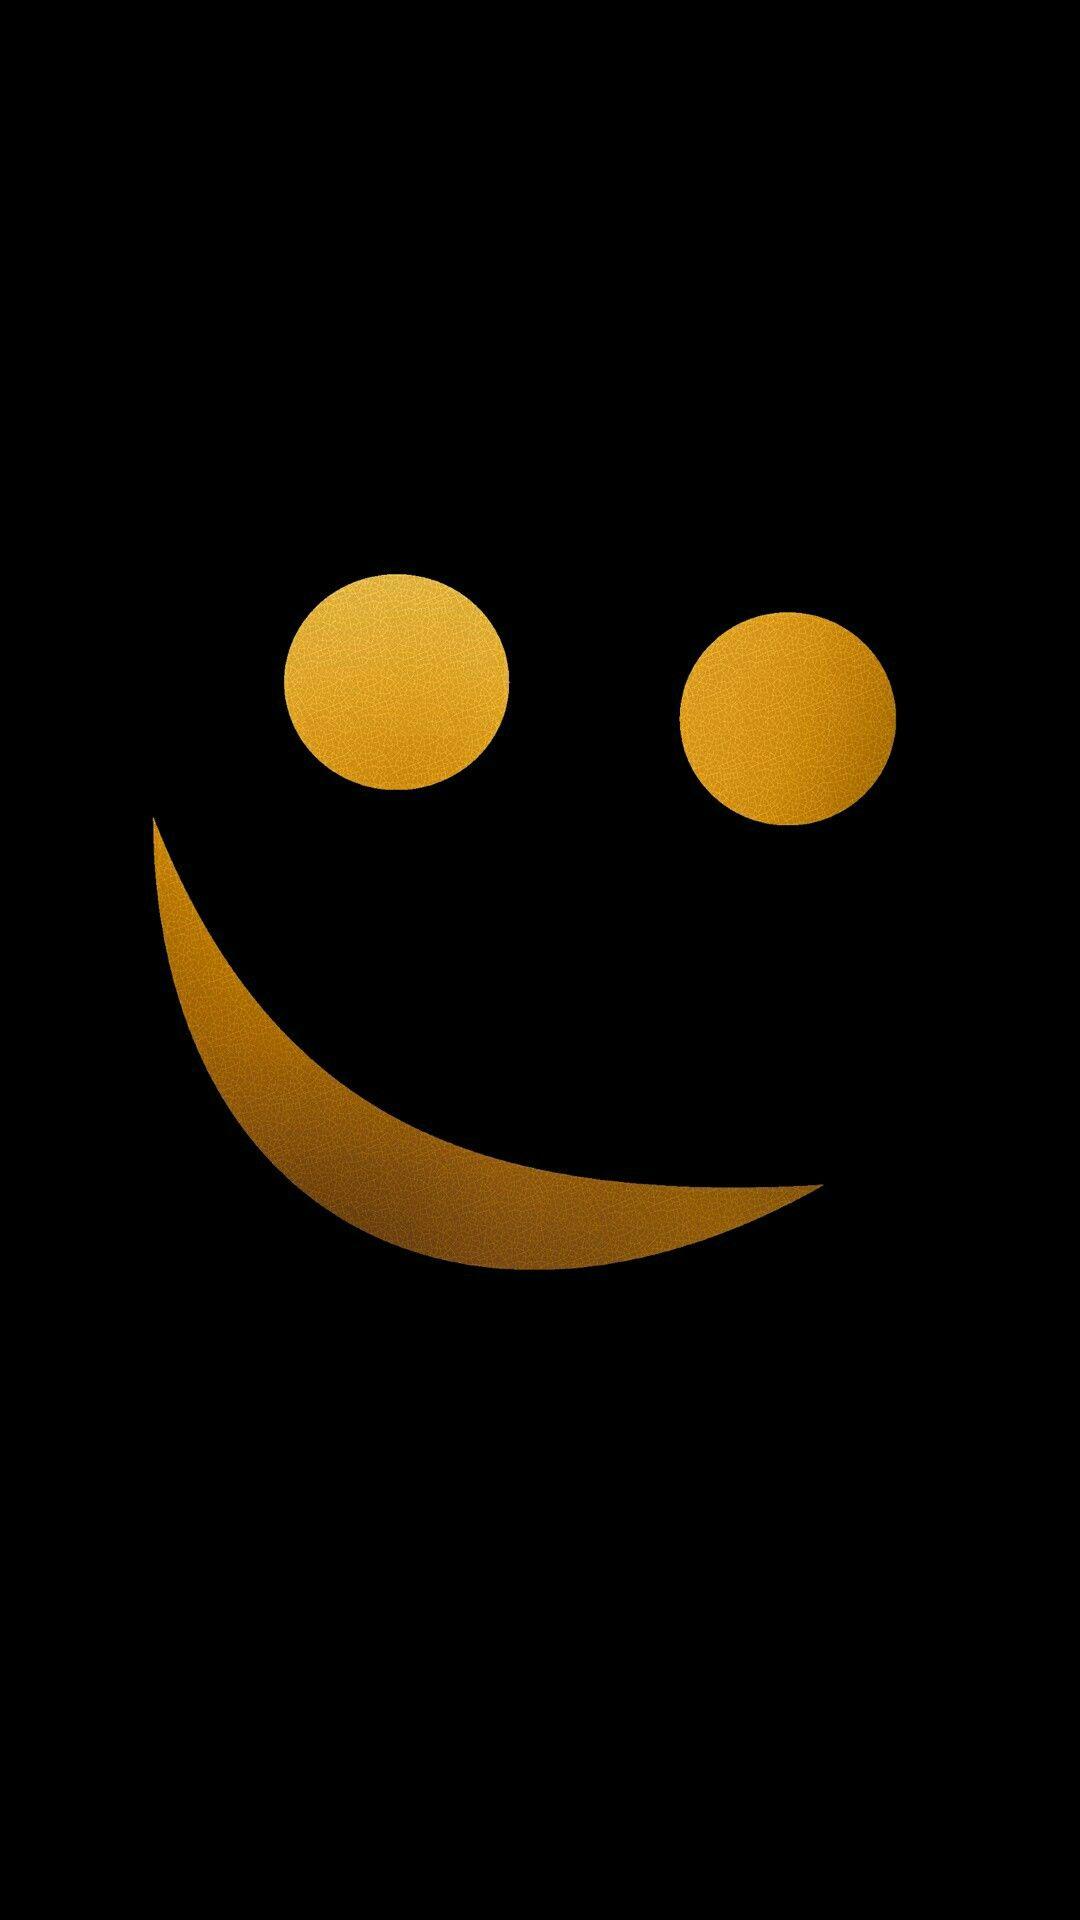 Smiley Best Iphone Wallpapers Smile Wallpaper Emoji Wallpaper